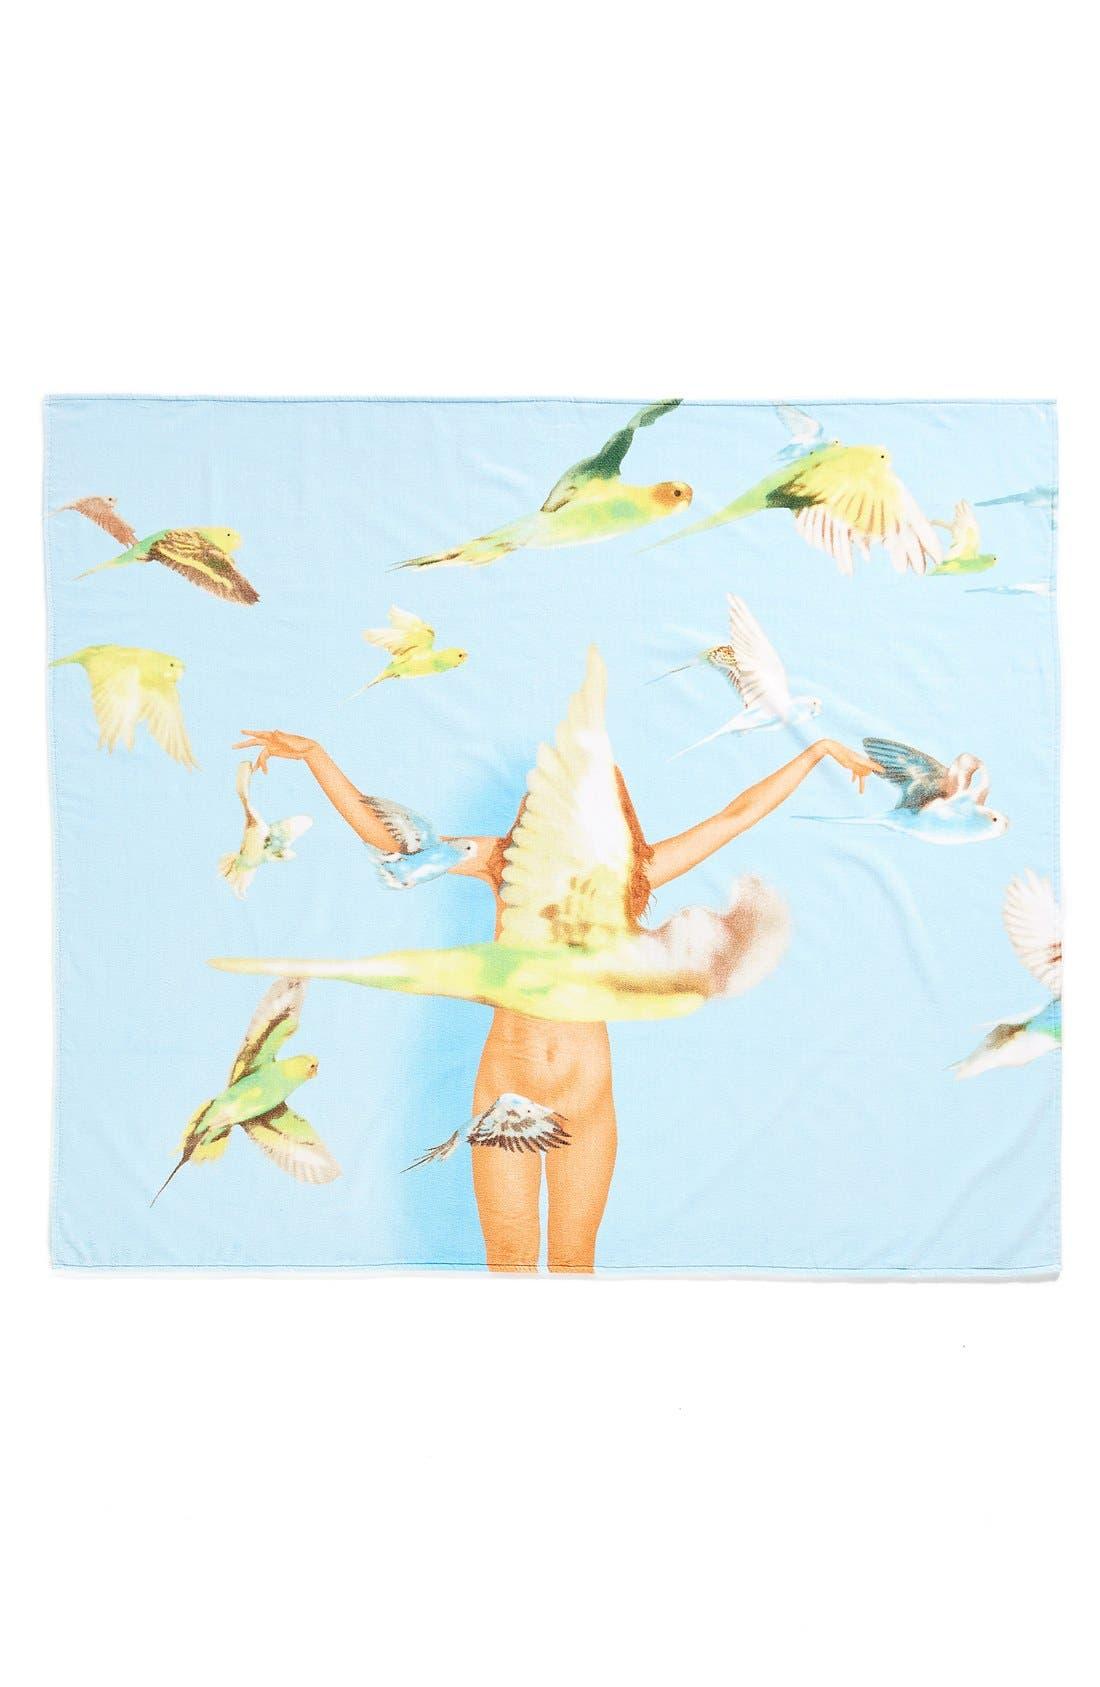 Main Image - Works on Whatever (WOW) 'Ryan McGinley' Beach Towel